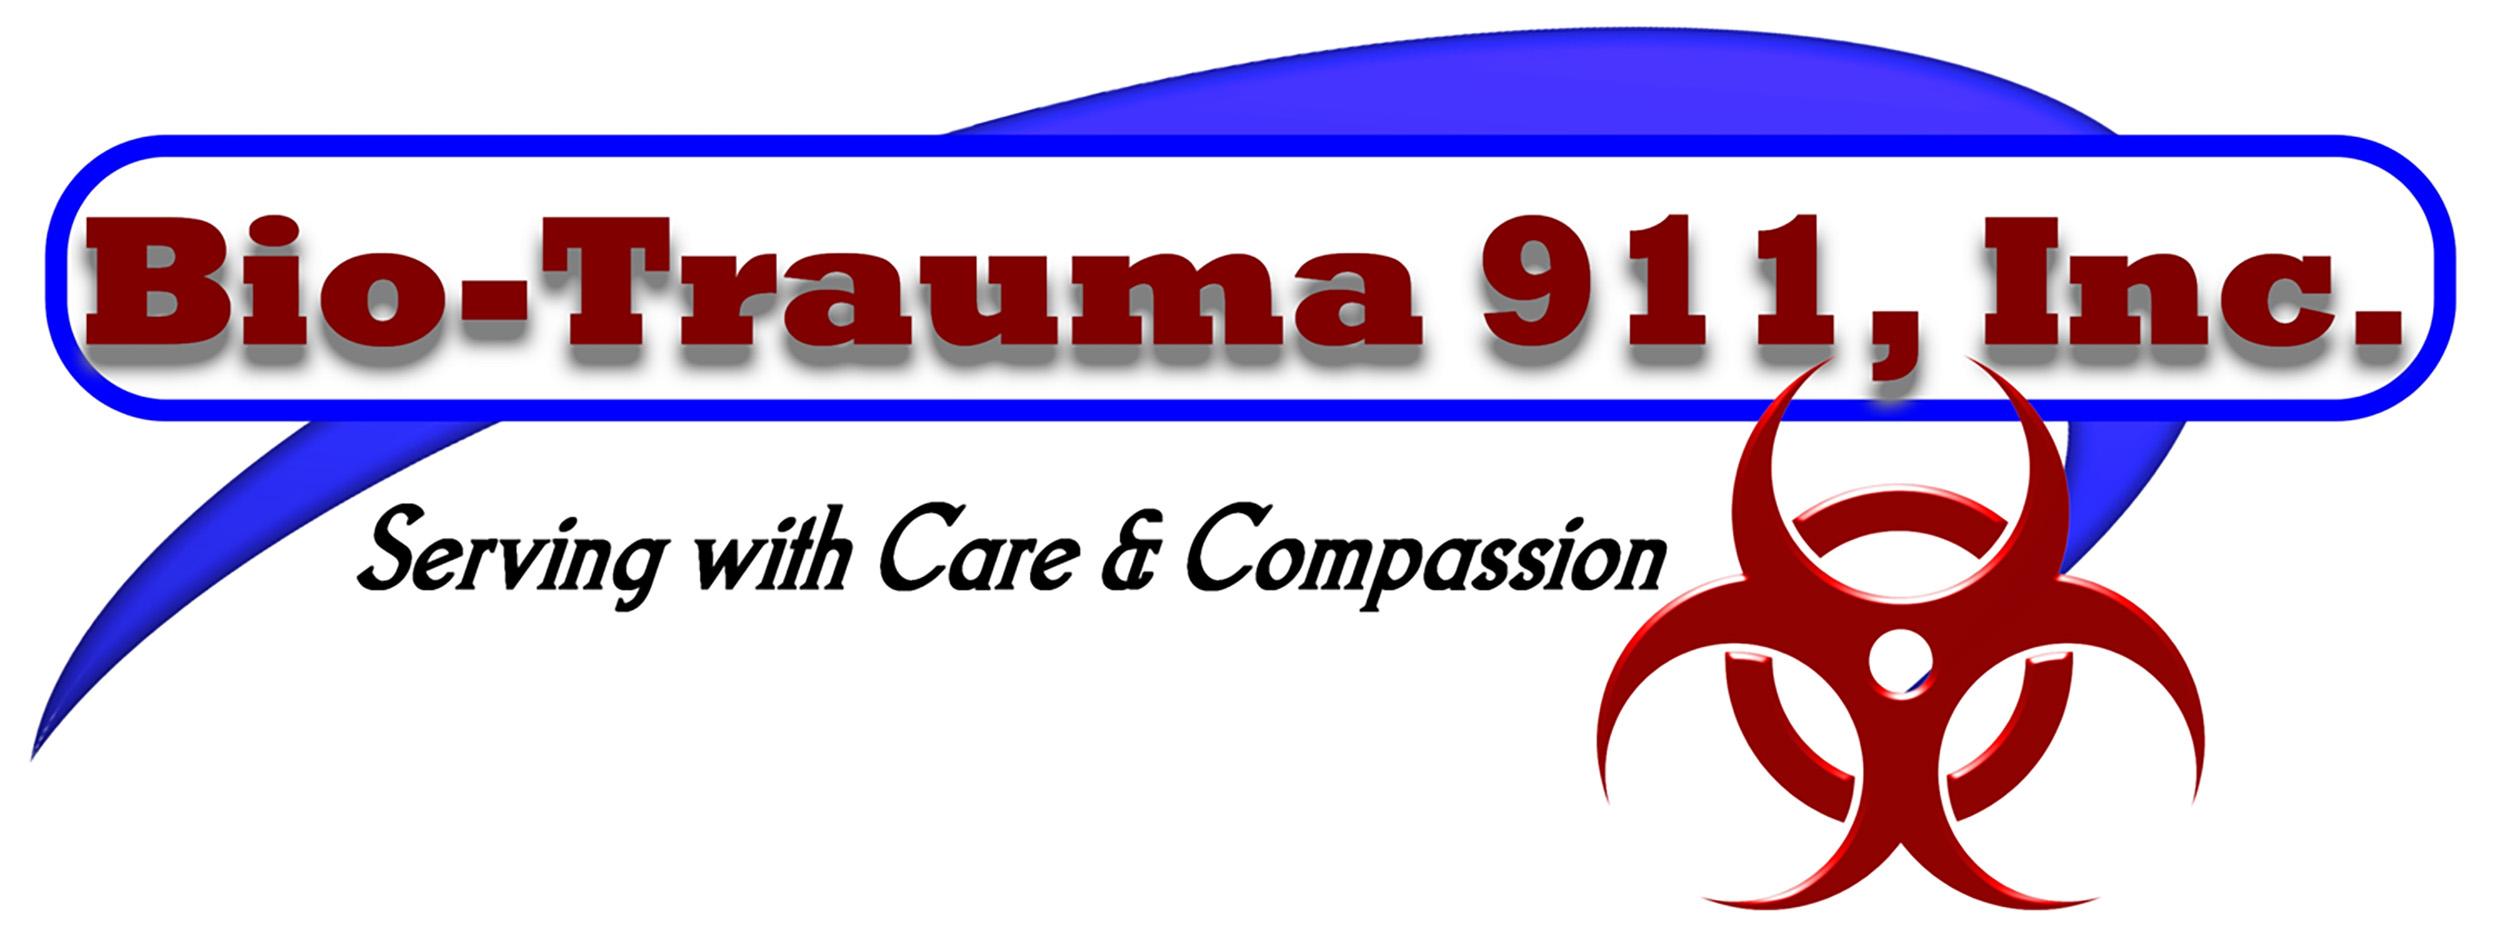 Bio-Trauma 911 Inc.